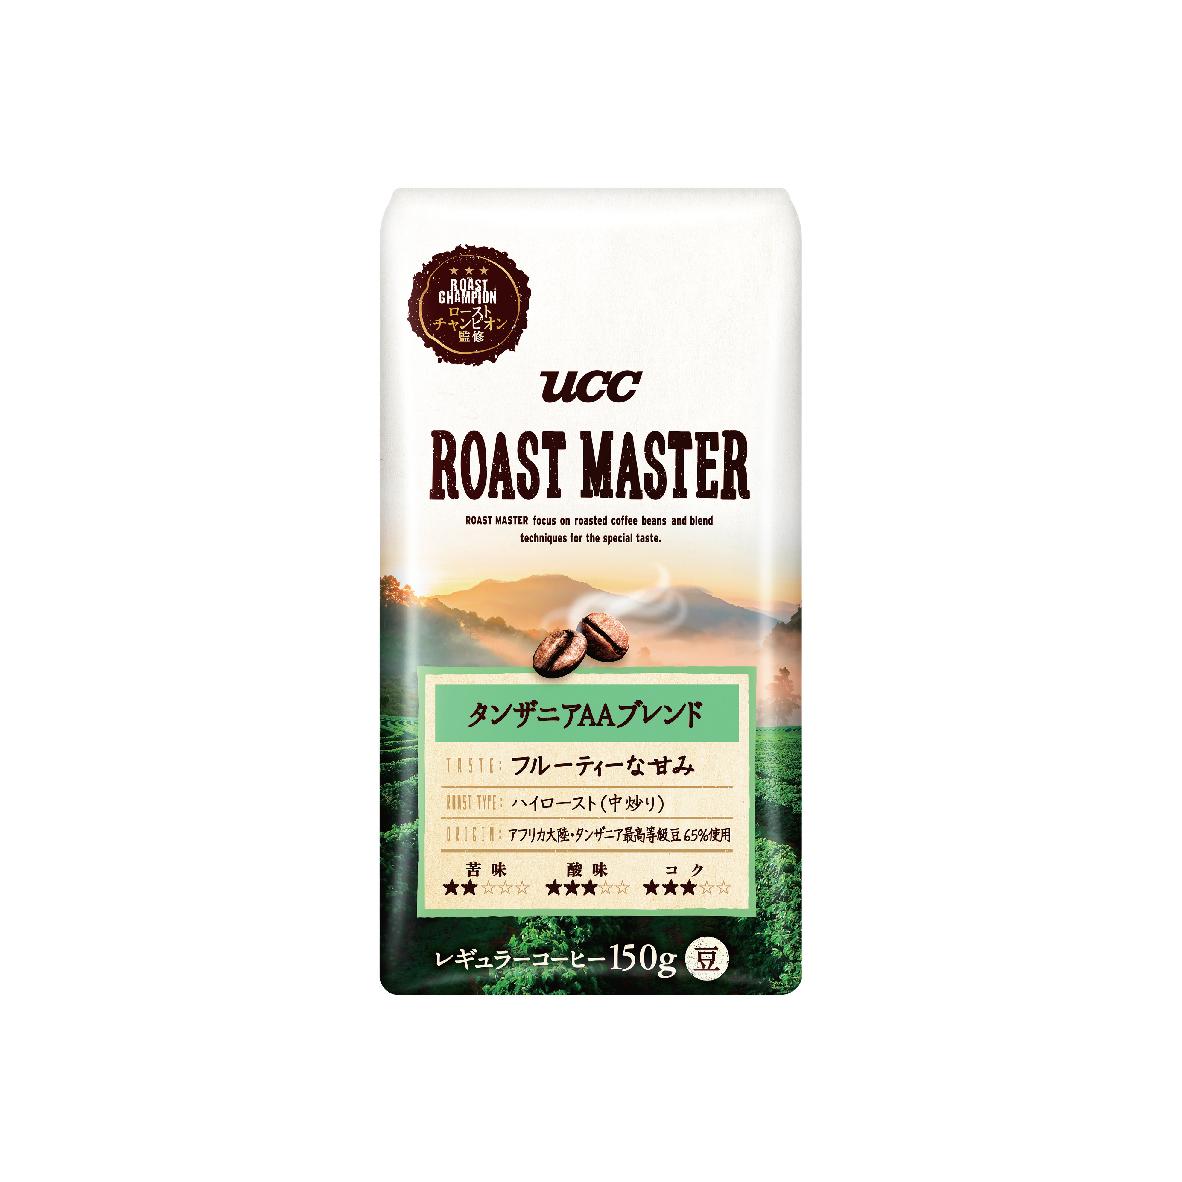 UCC Roast Master Tanzania AA Coffee Blend Roasted Coffee Beans